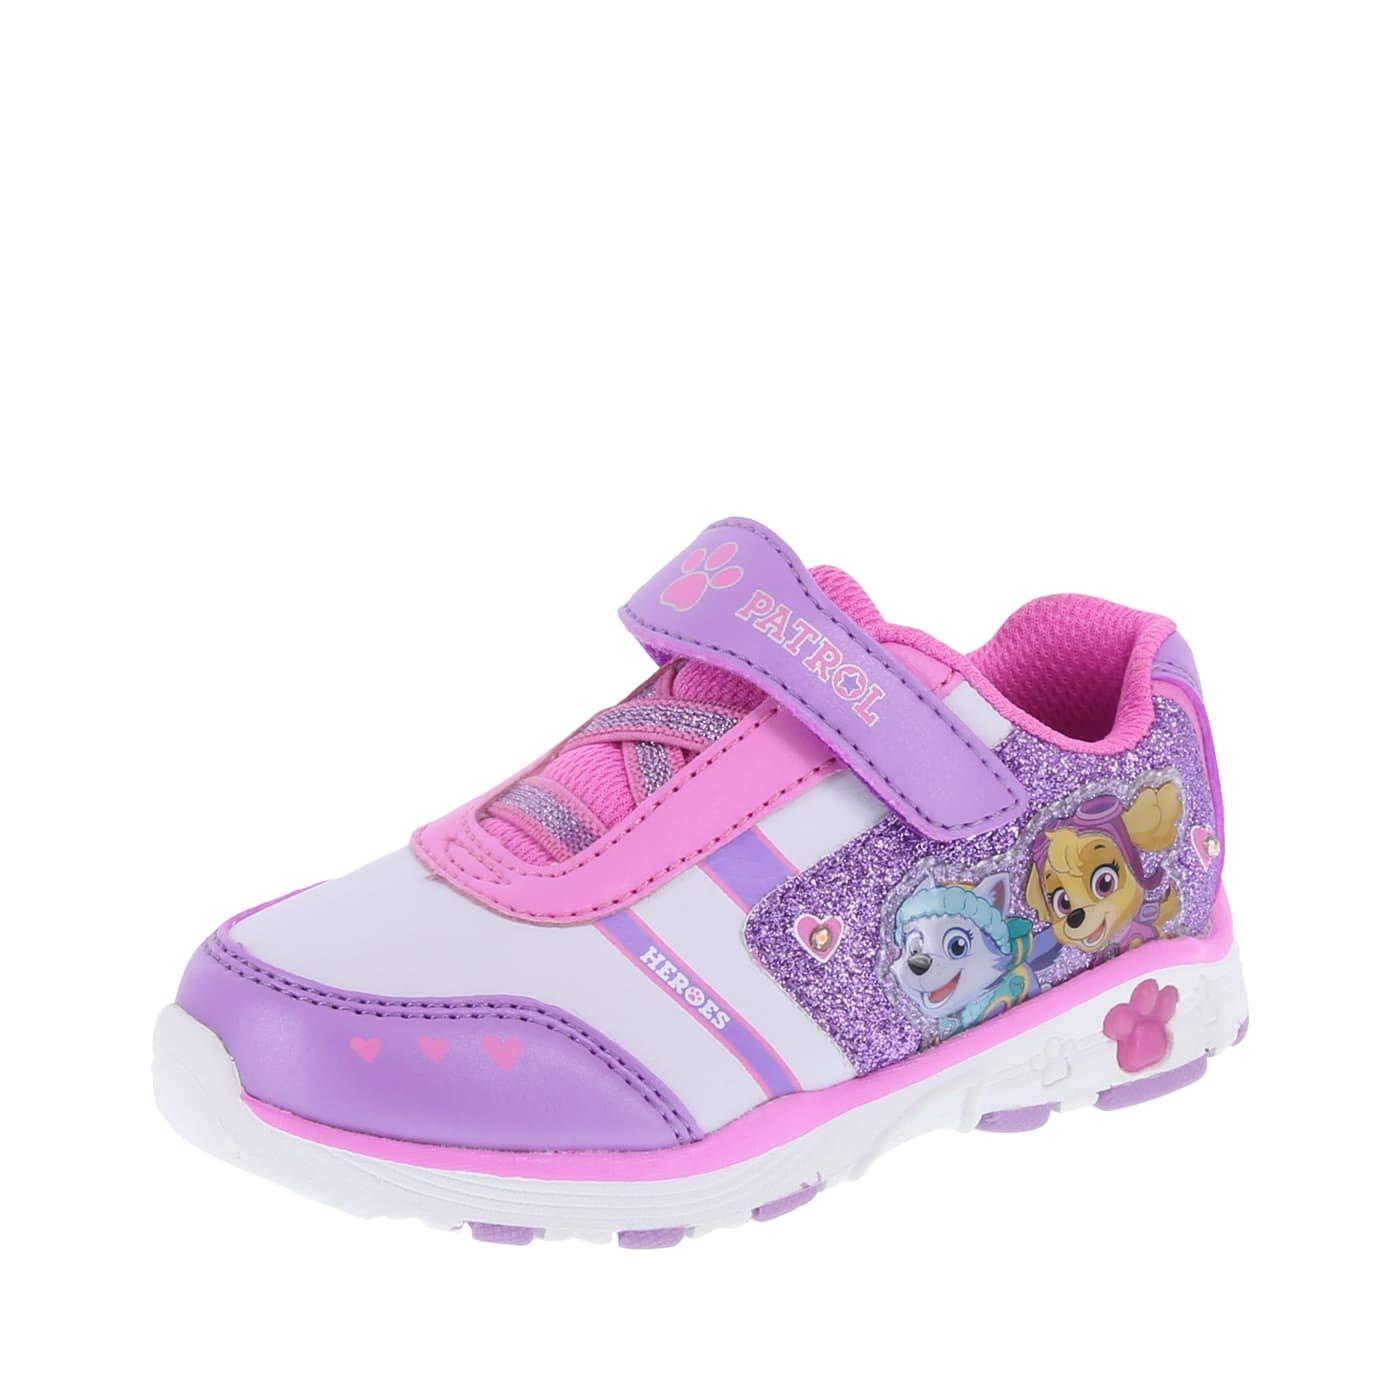 Nickelodeon Shoes Paw Patrol Girl's